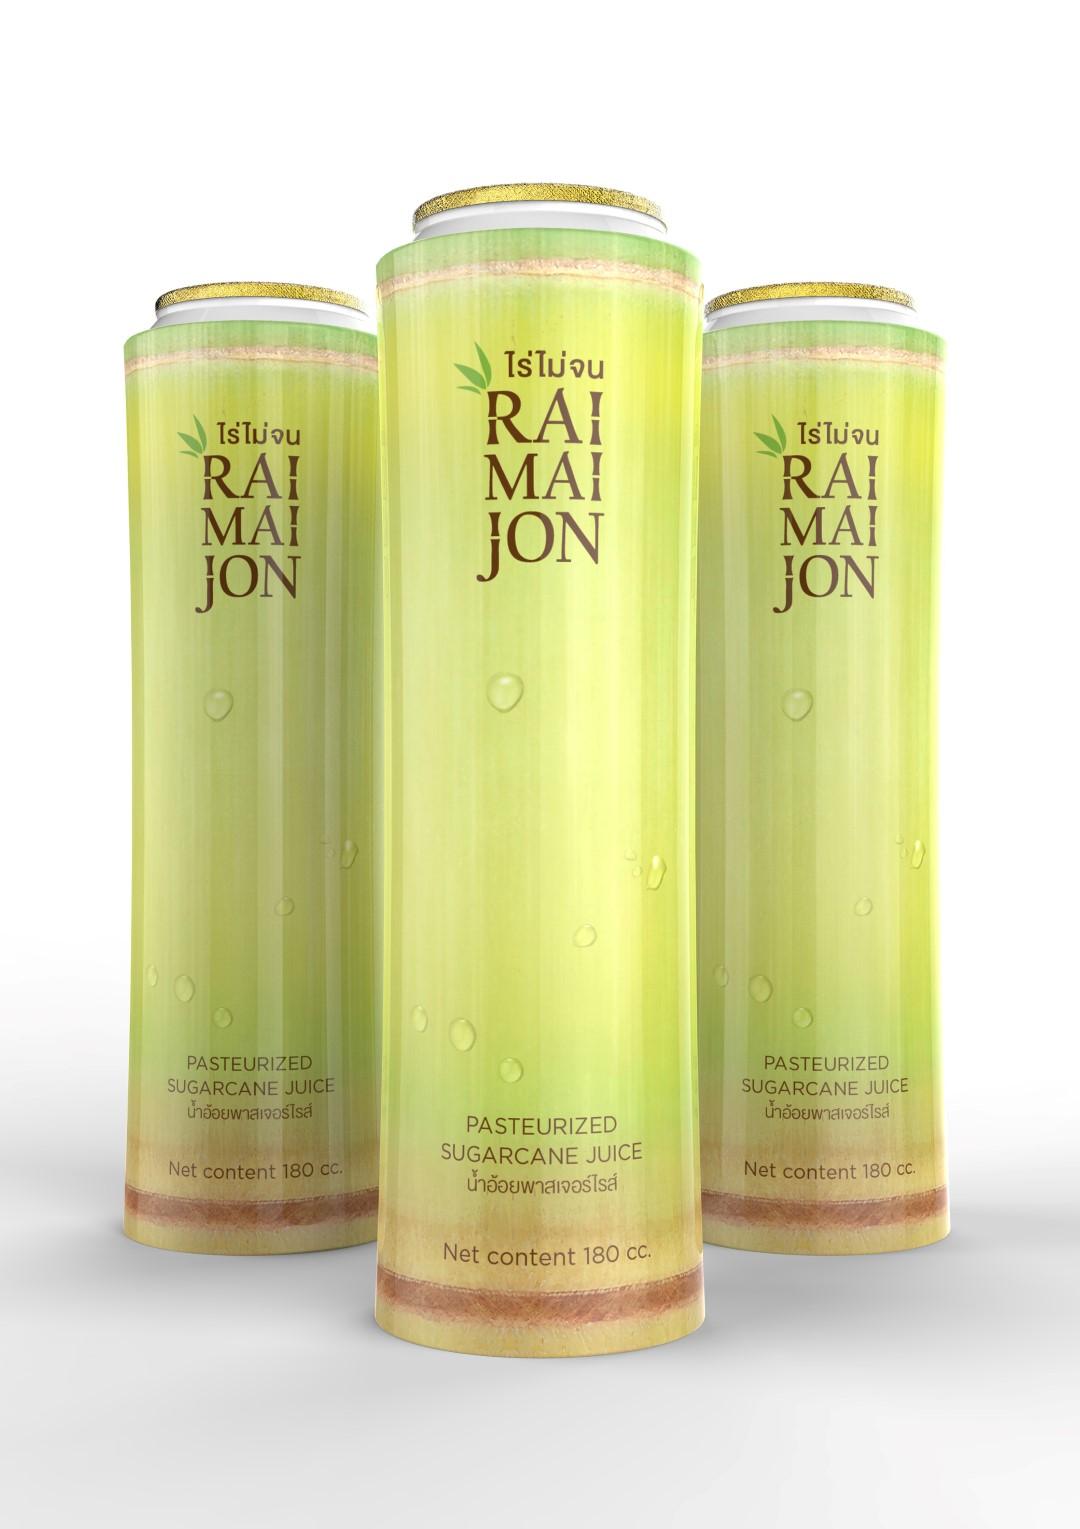 Prompt Design – Raimaijon Pasteurized Sugarcane Juice